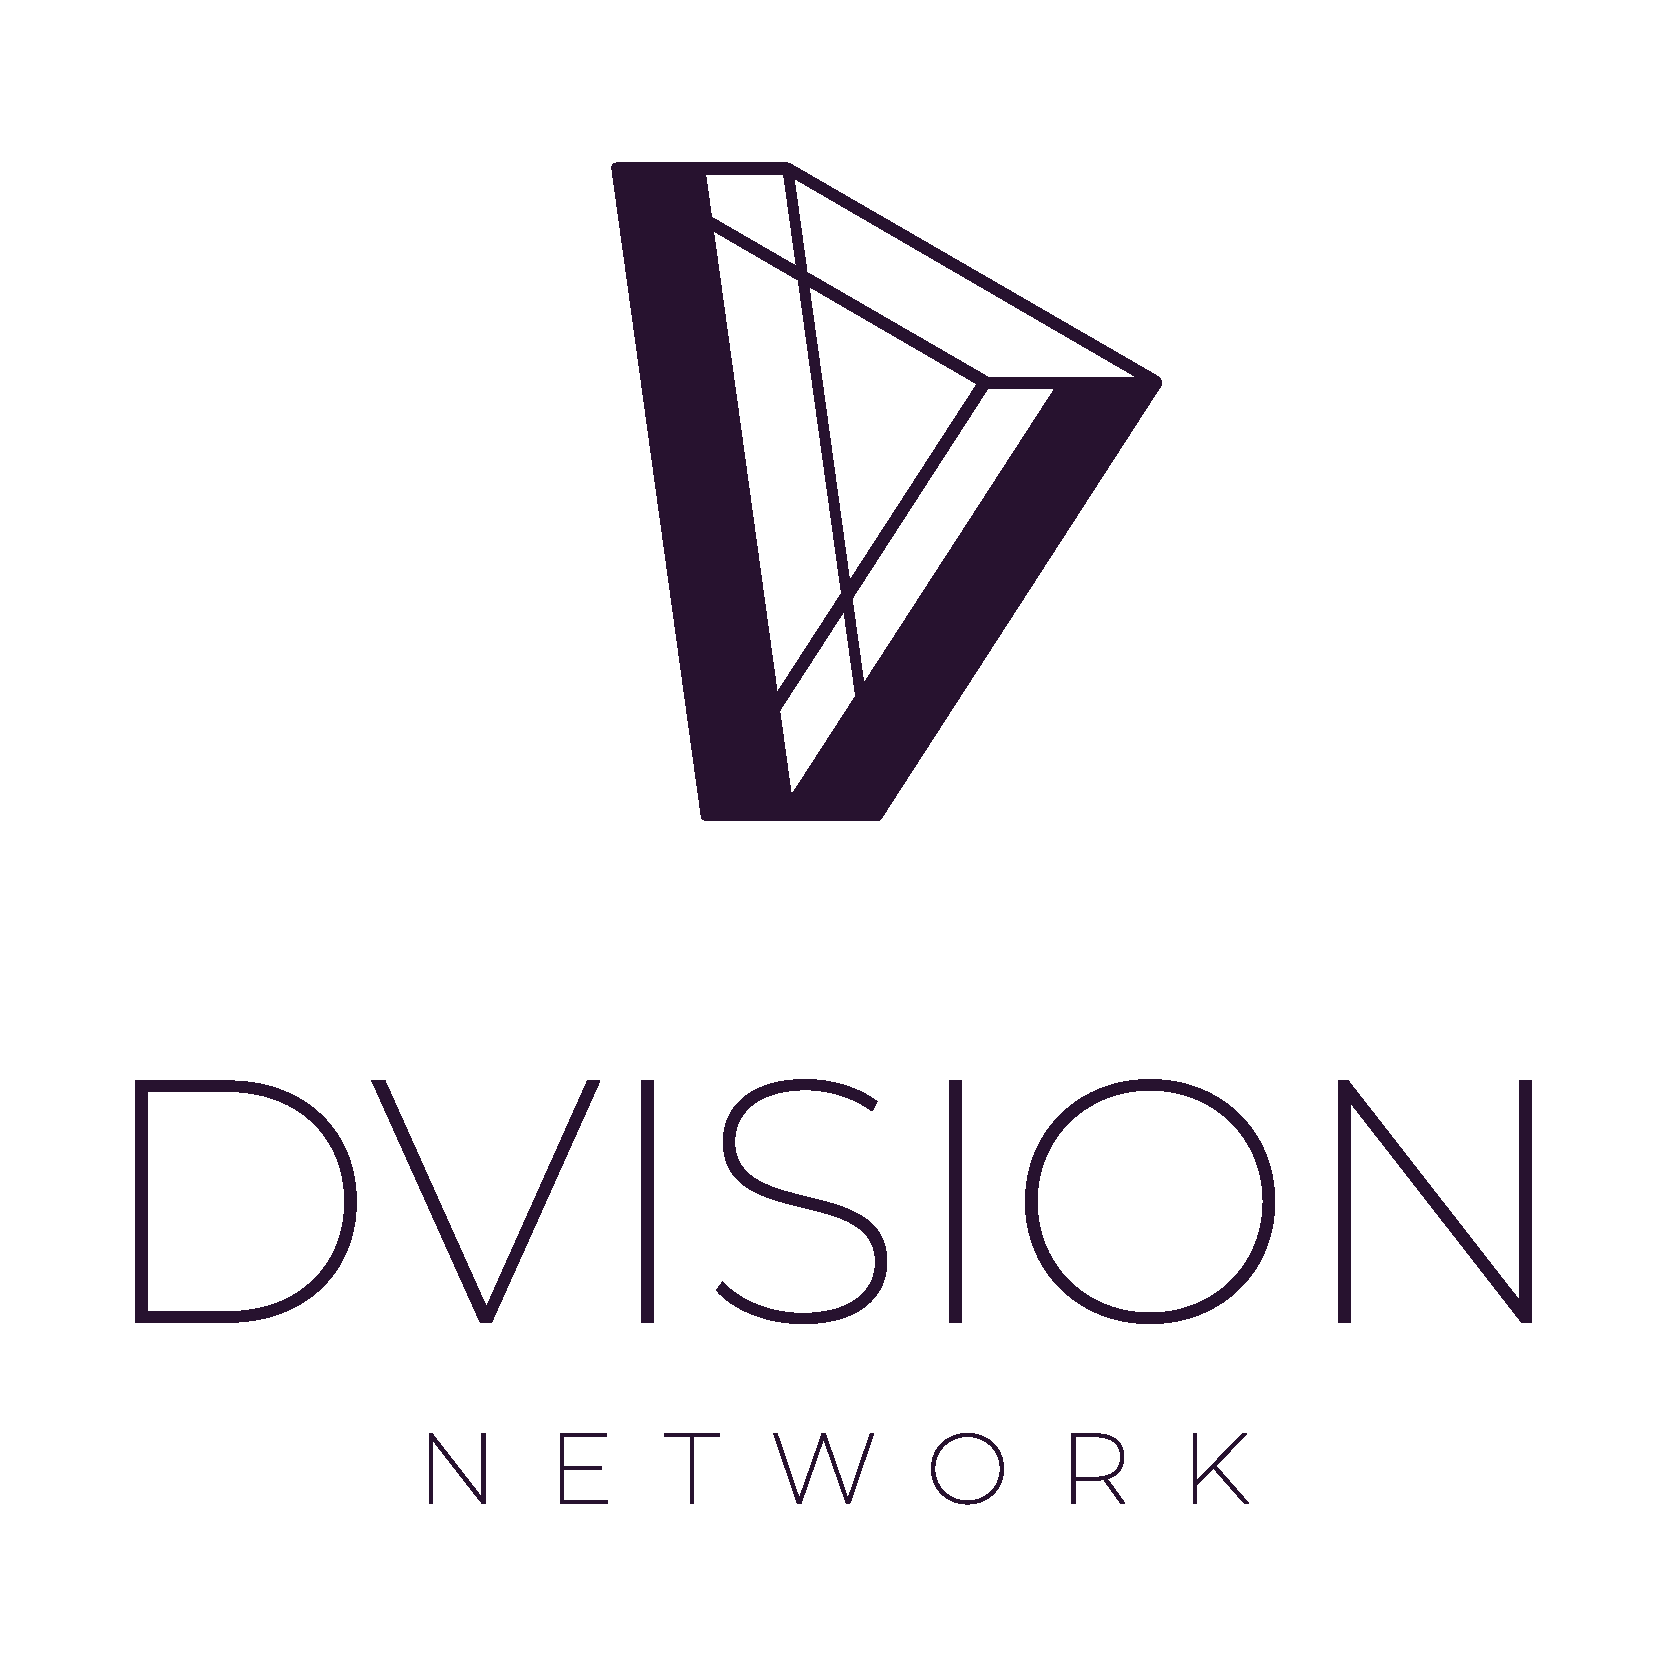 Dvision Network  logo